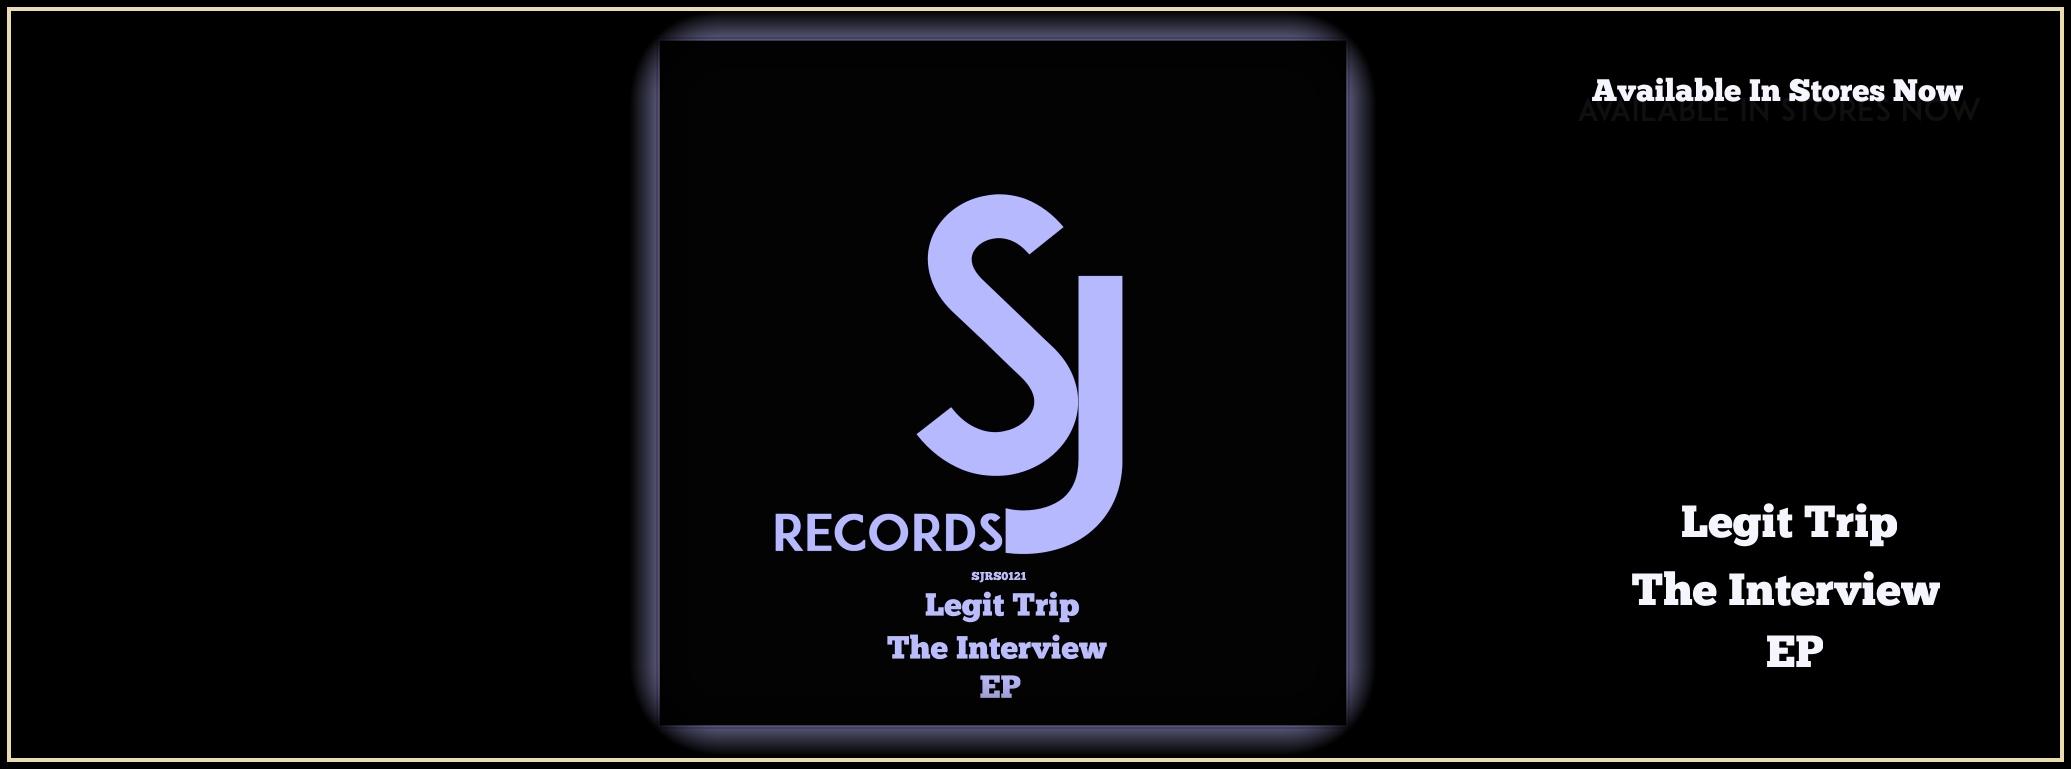 legit-trip-slide